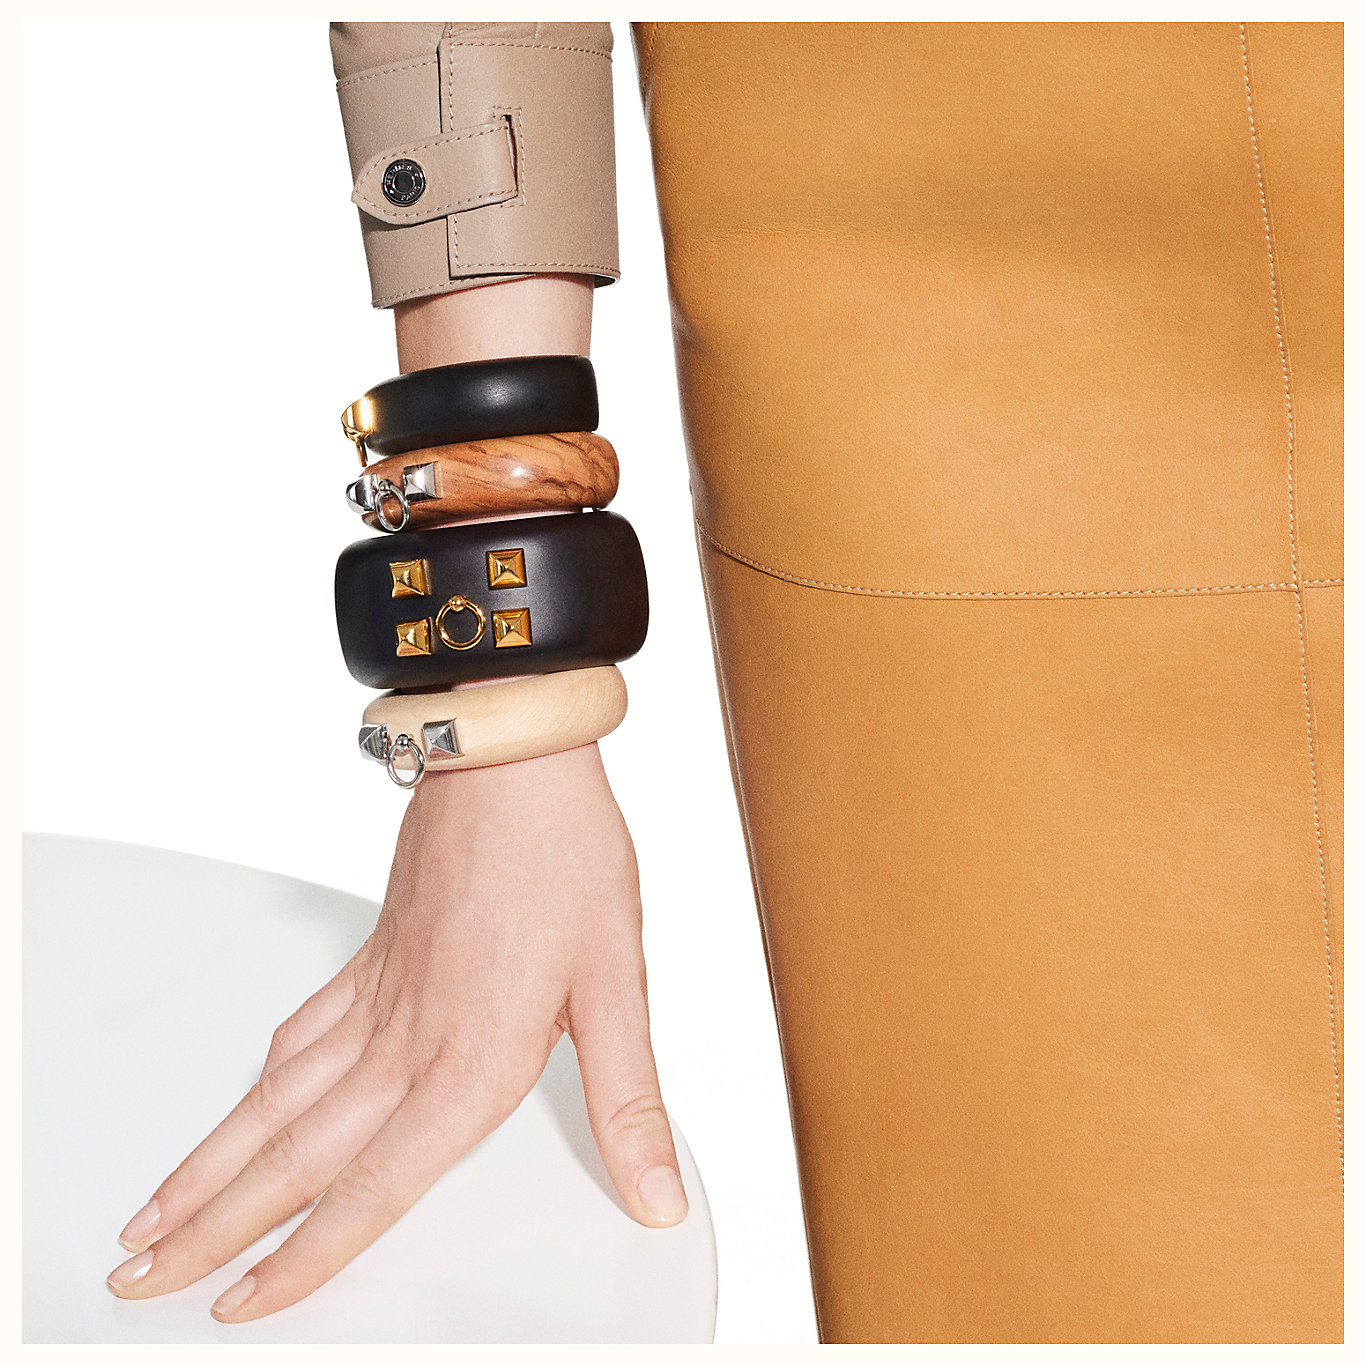 medor-cuff-bracelet--052987F%2001-worn-10-50-0-1366-1366_b.jpg